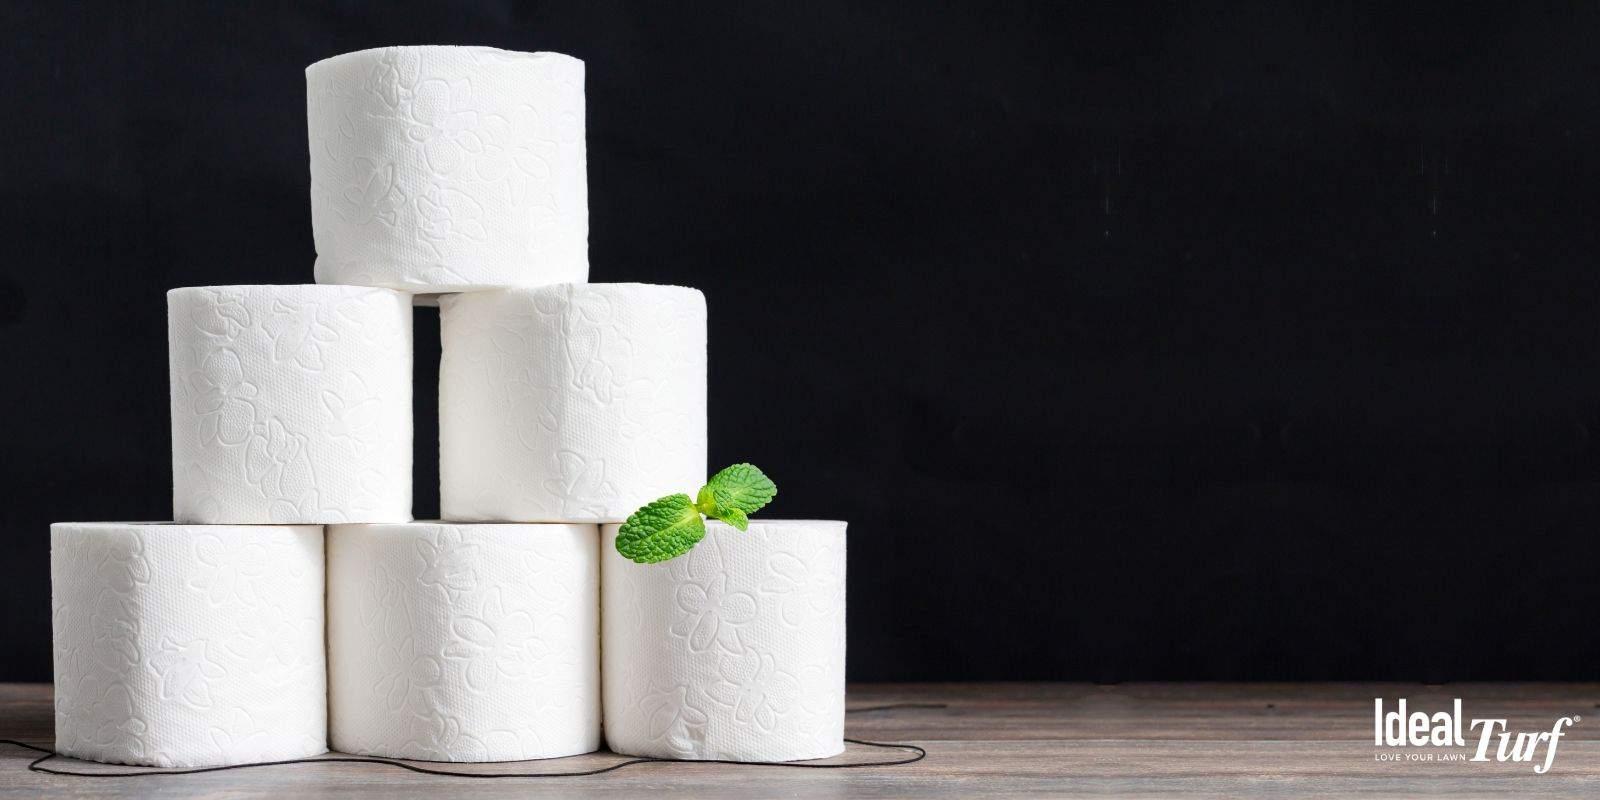 Use Eco-Friendly Toilet Paper